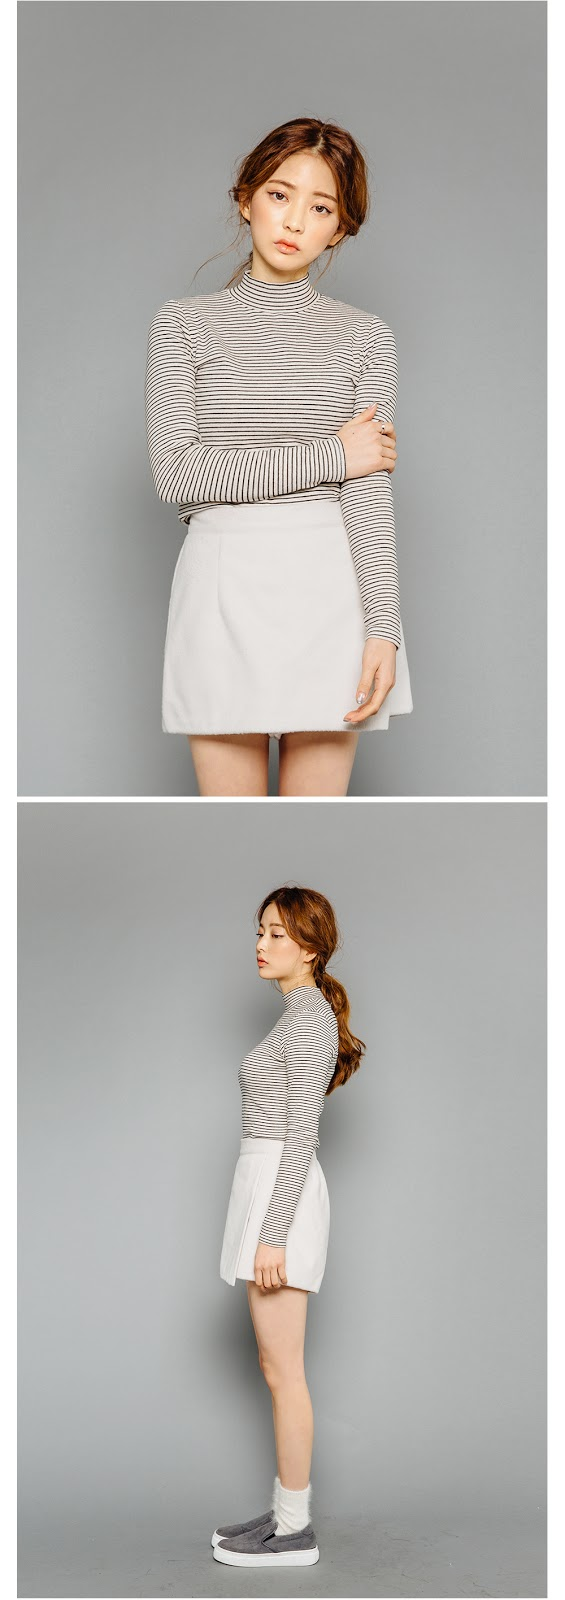 Fashion+Designer